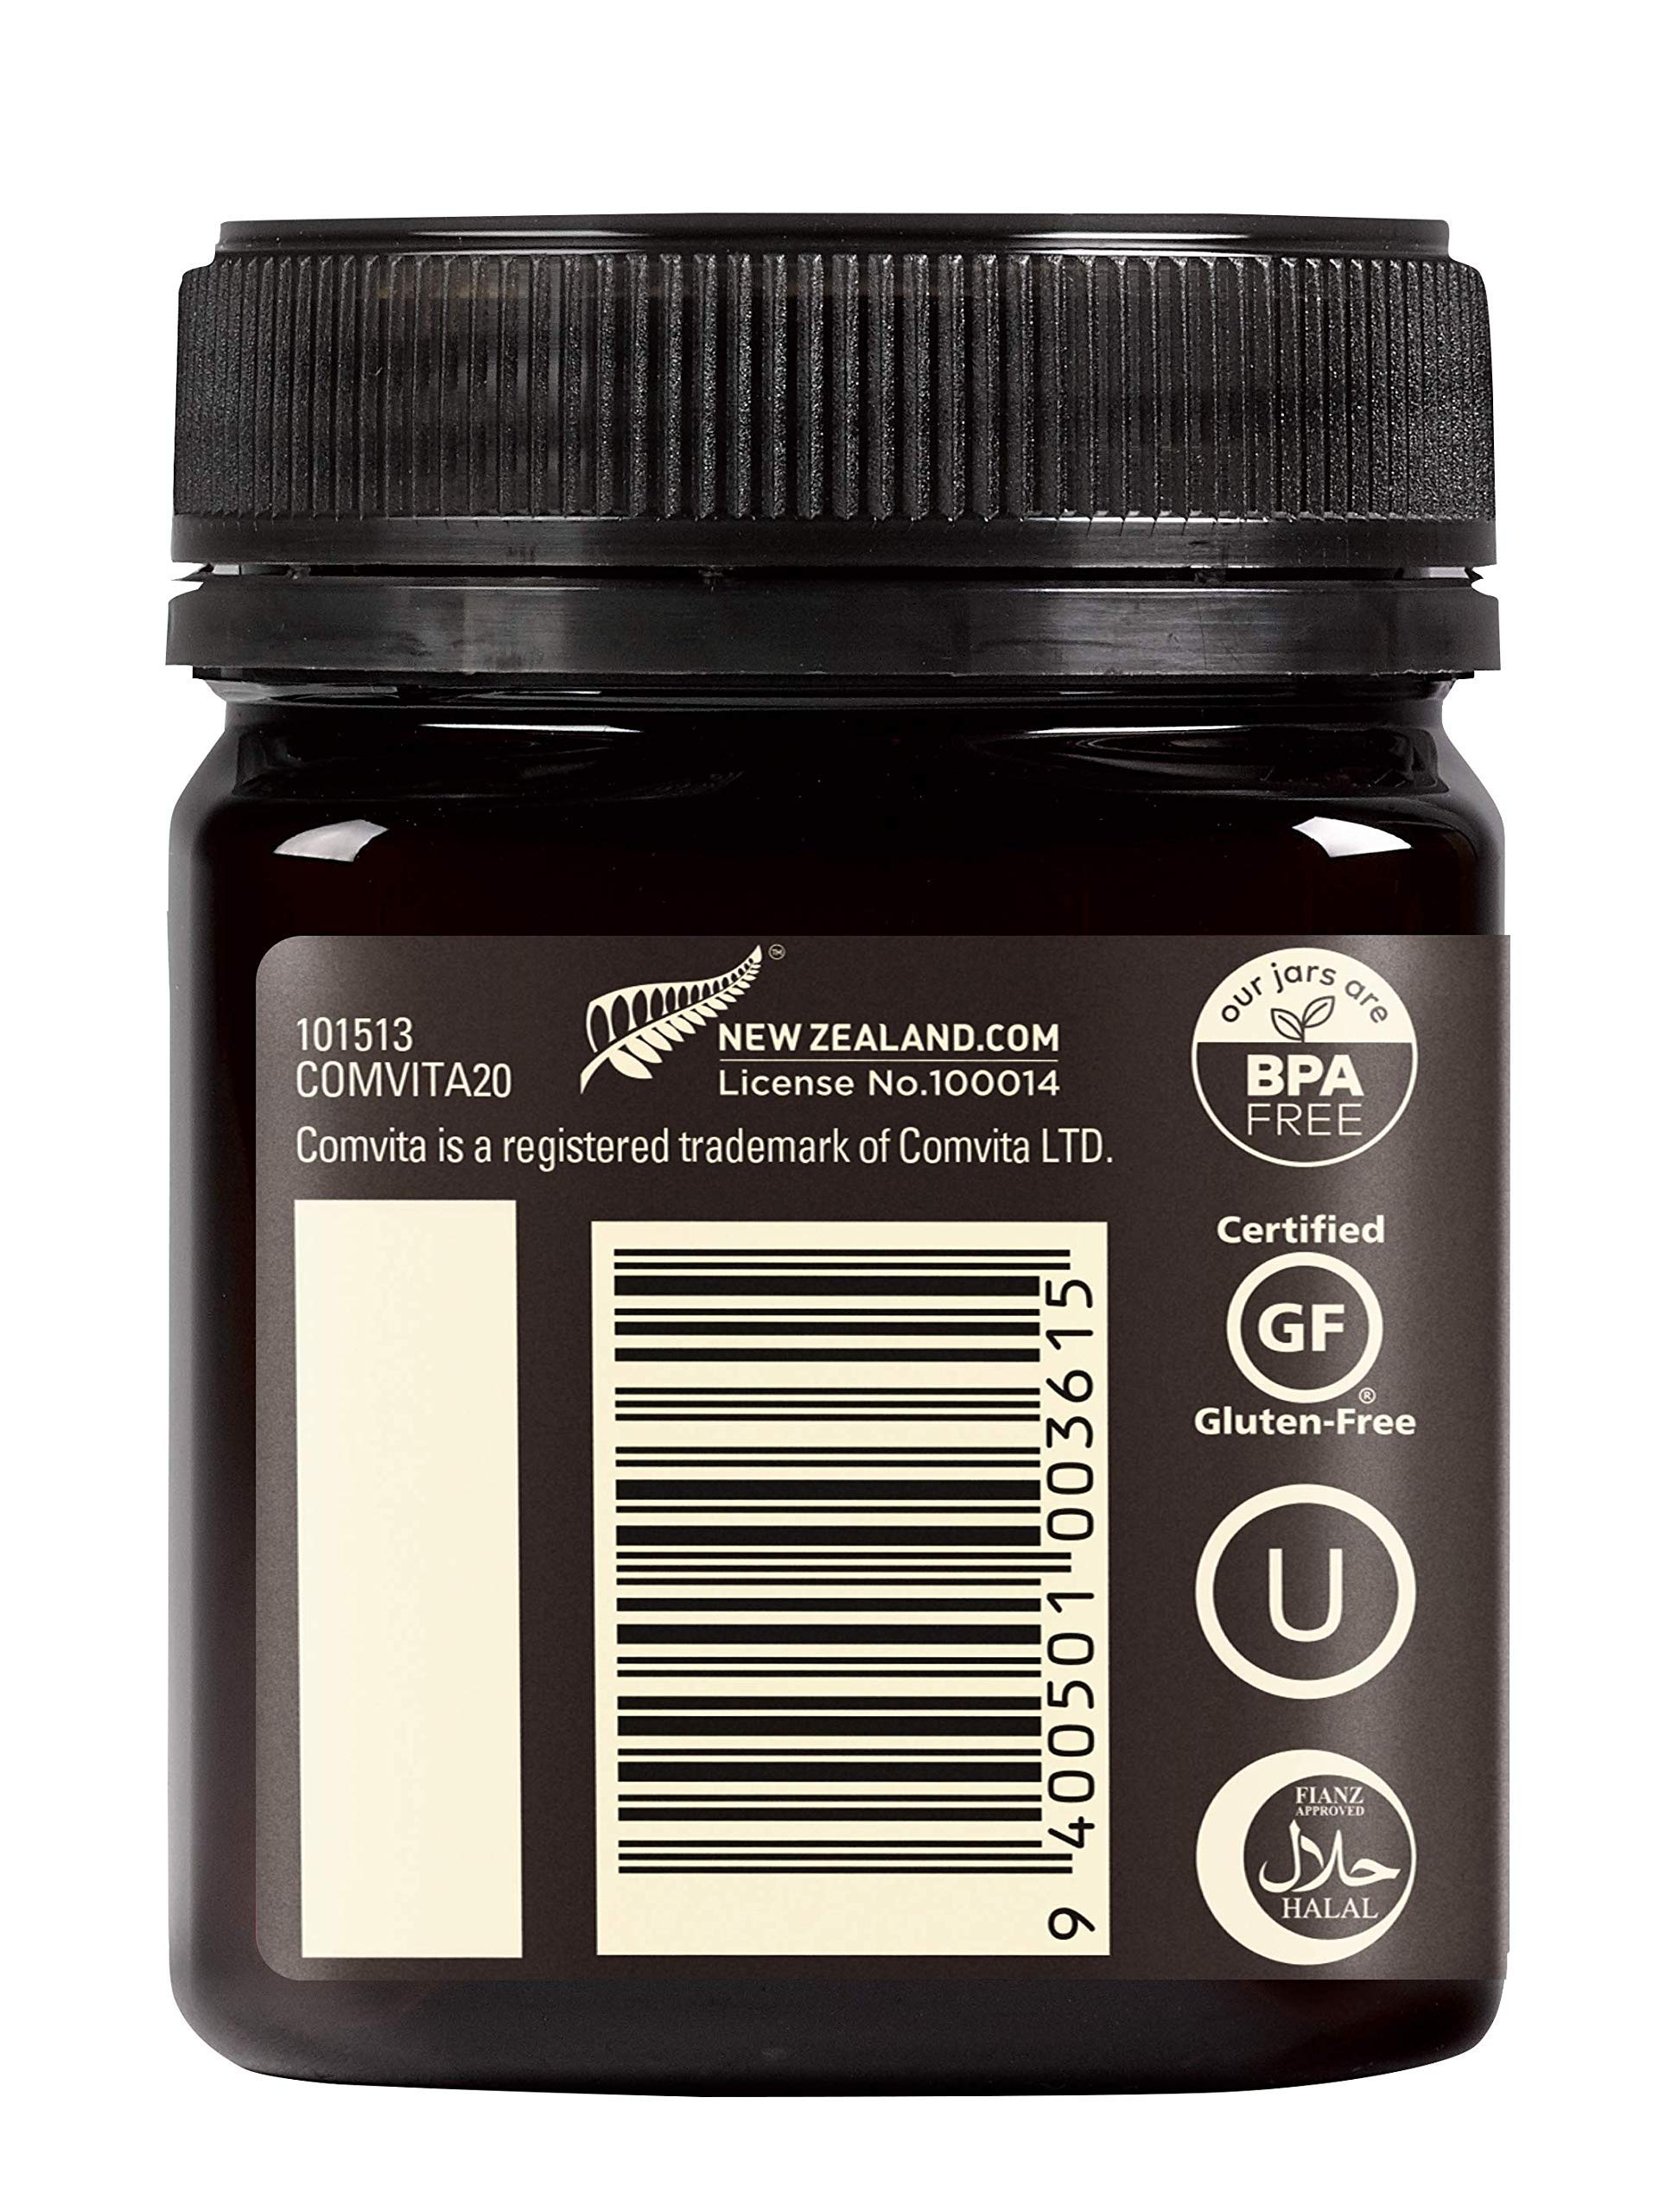 Comvita UMF 10+ (MGO 263+) Raw Manuka Honey | 8.8 oz I New Zealand's #1 Manuka Brand | Wild, Non-GMO I Premium Grade by Comvita (Image #5)